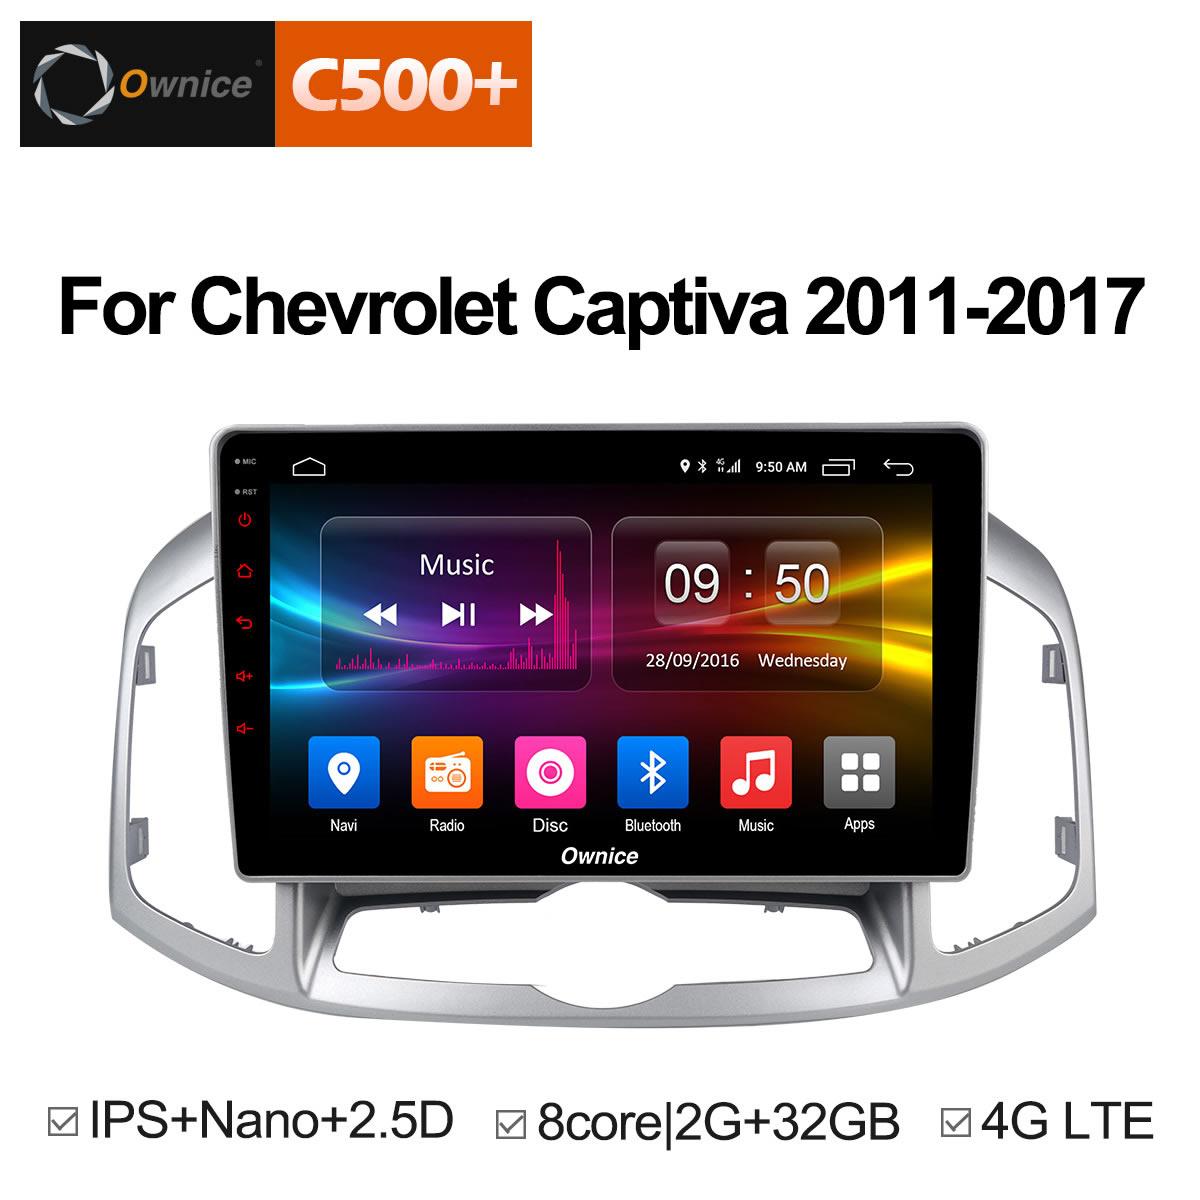 Ownice C500 + G10 Android 8.1 8 Core Voiture DVD Stéréo Pour Chevrolet Captiva 2011-2017 Auto Radio GPS navigation Multimédia Audio